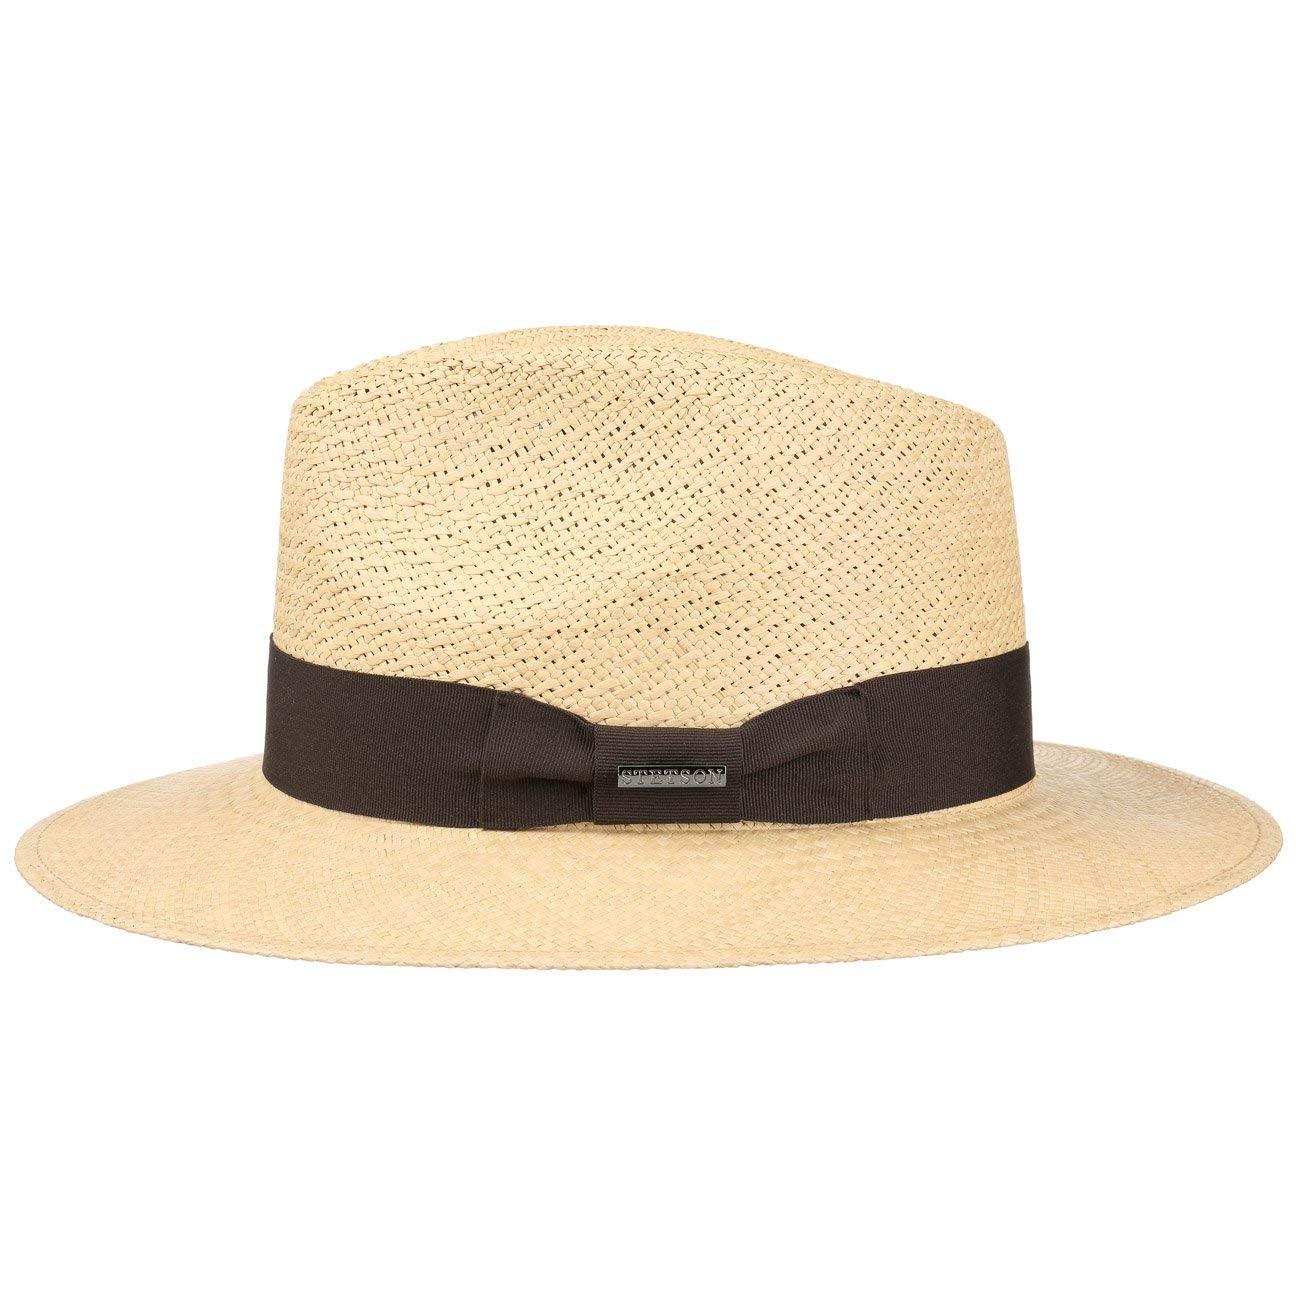 0c6fc732e7c Stetson Grady Panama Traveller Straw Hat Summer Sun  Amazon.co.uk  Clothing